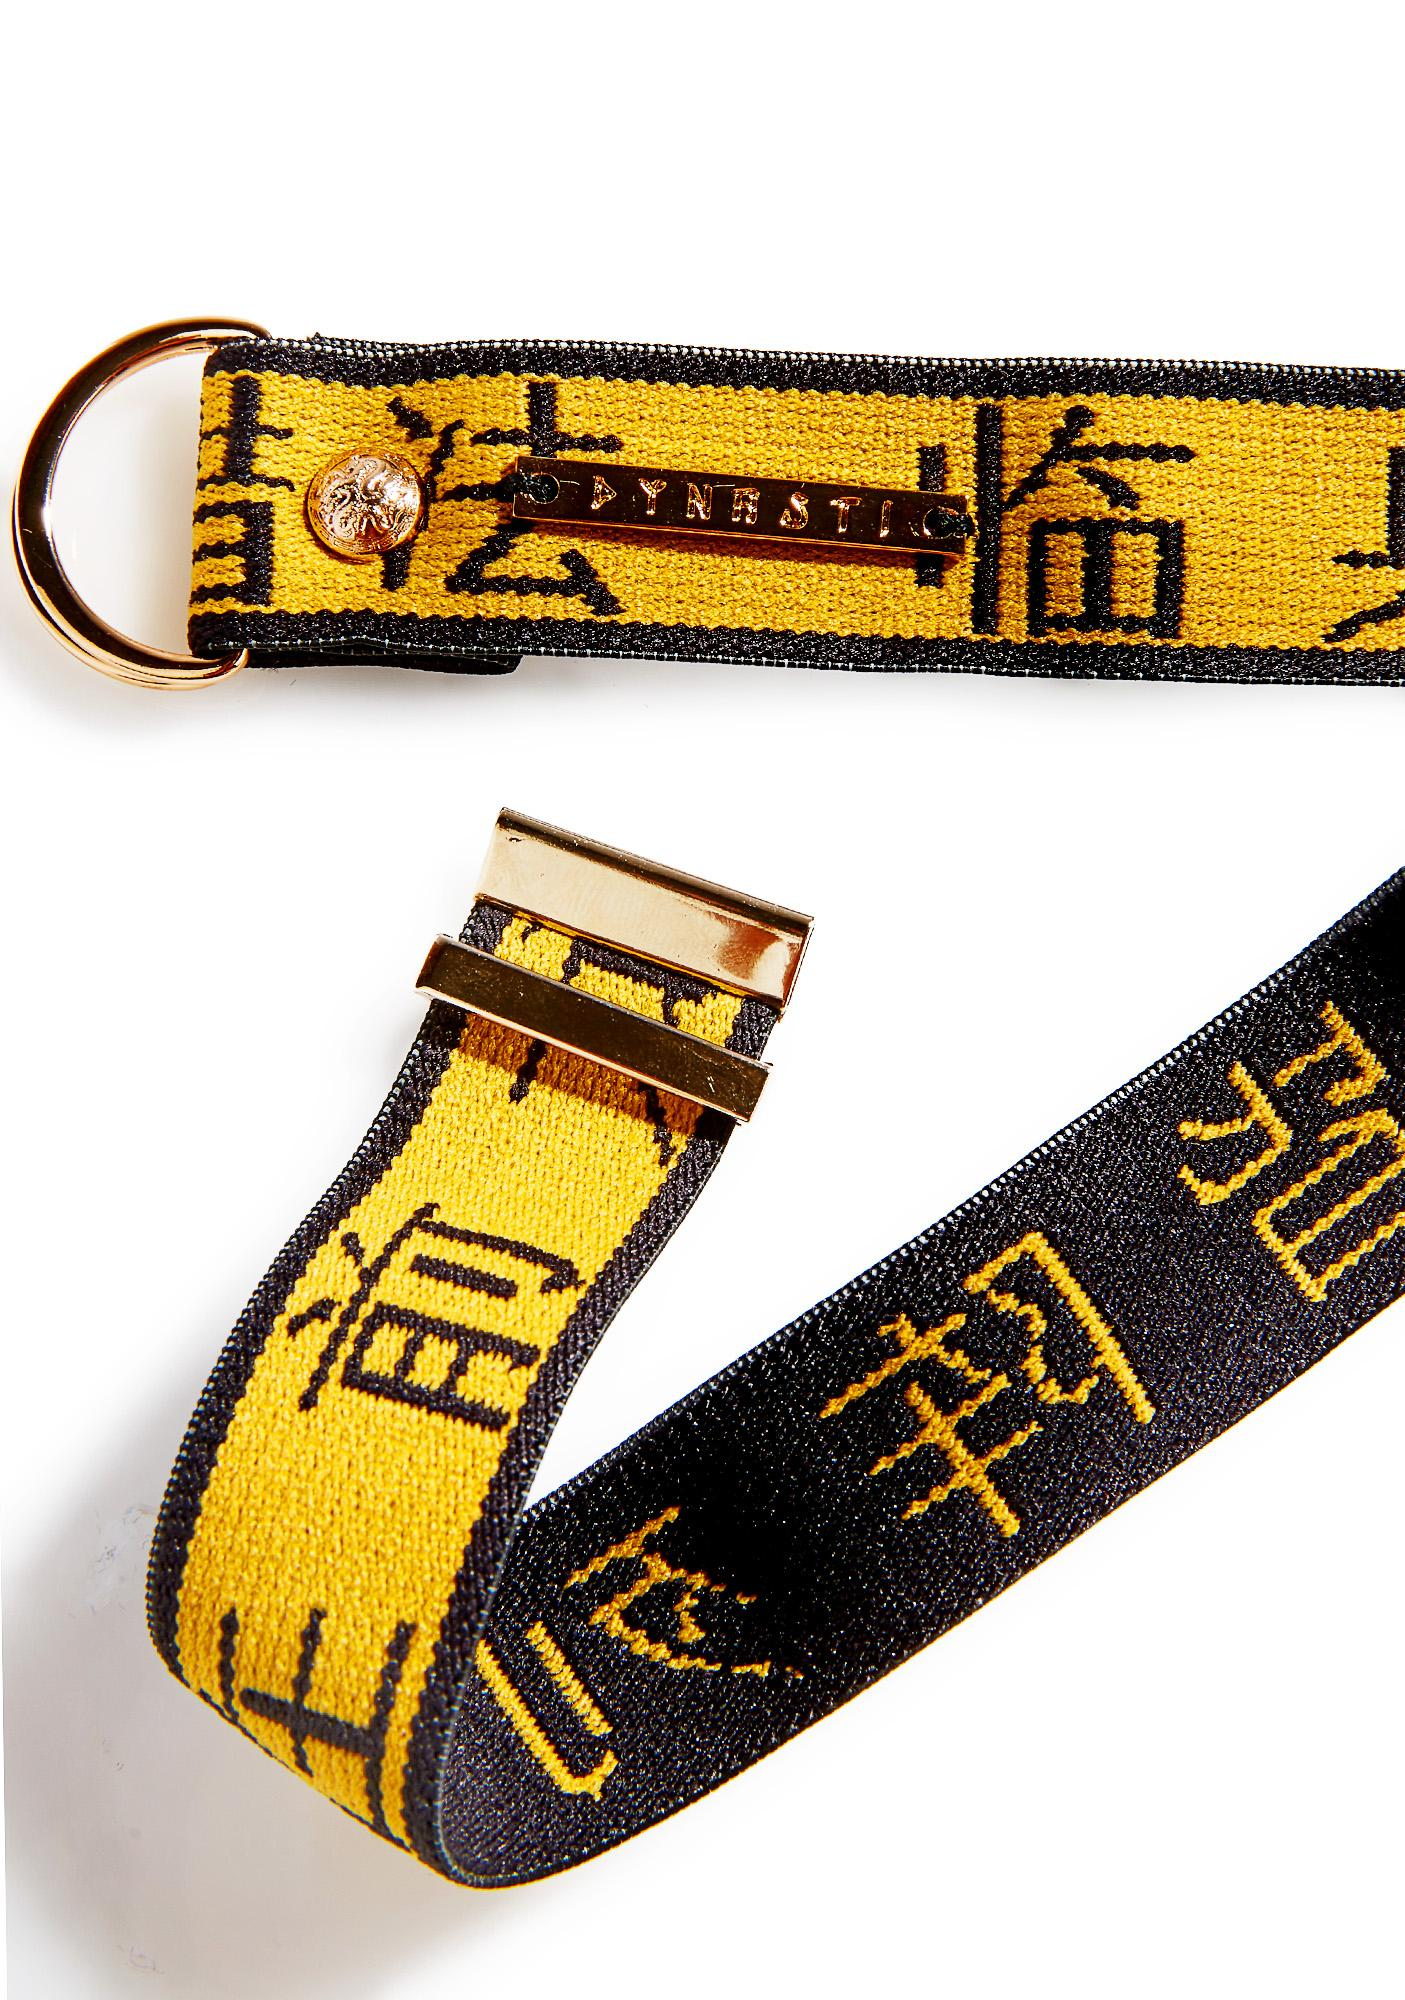 Dynasti Kuji Kiri Adjustable Headband